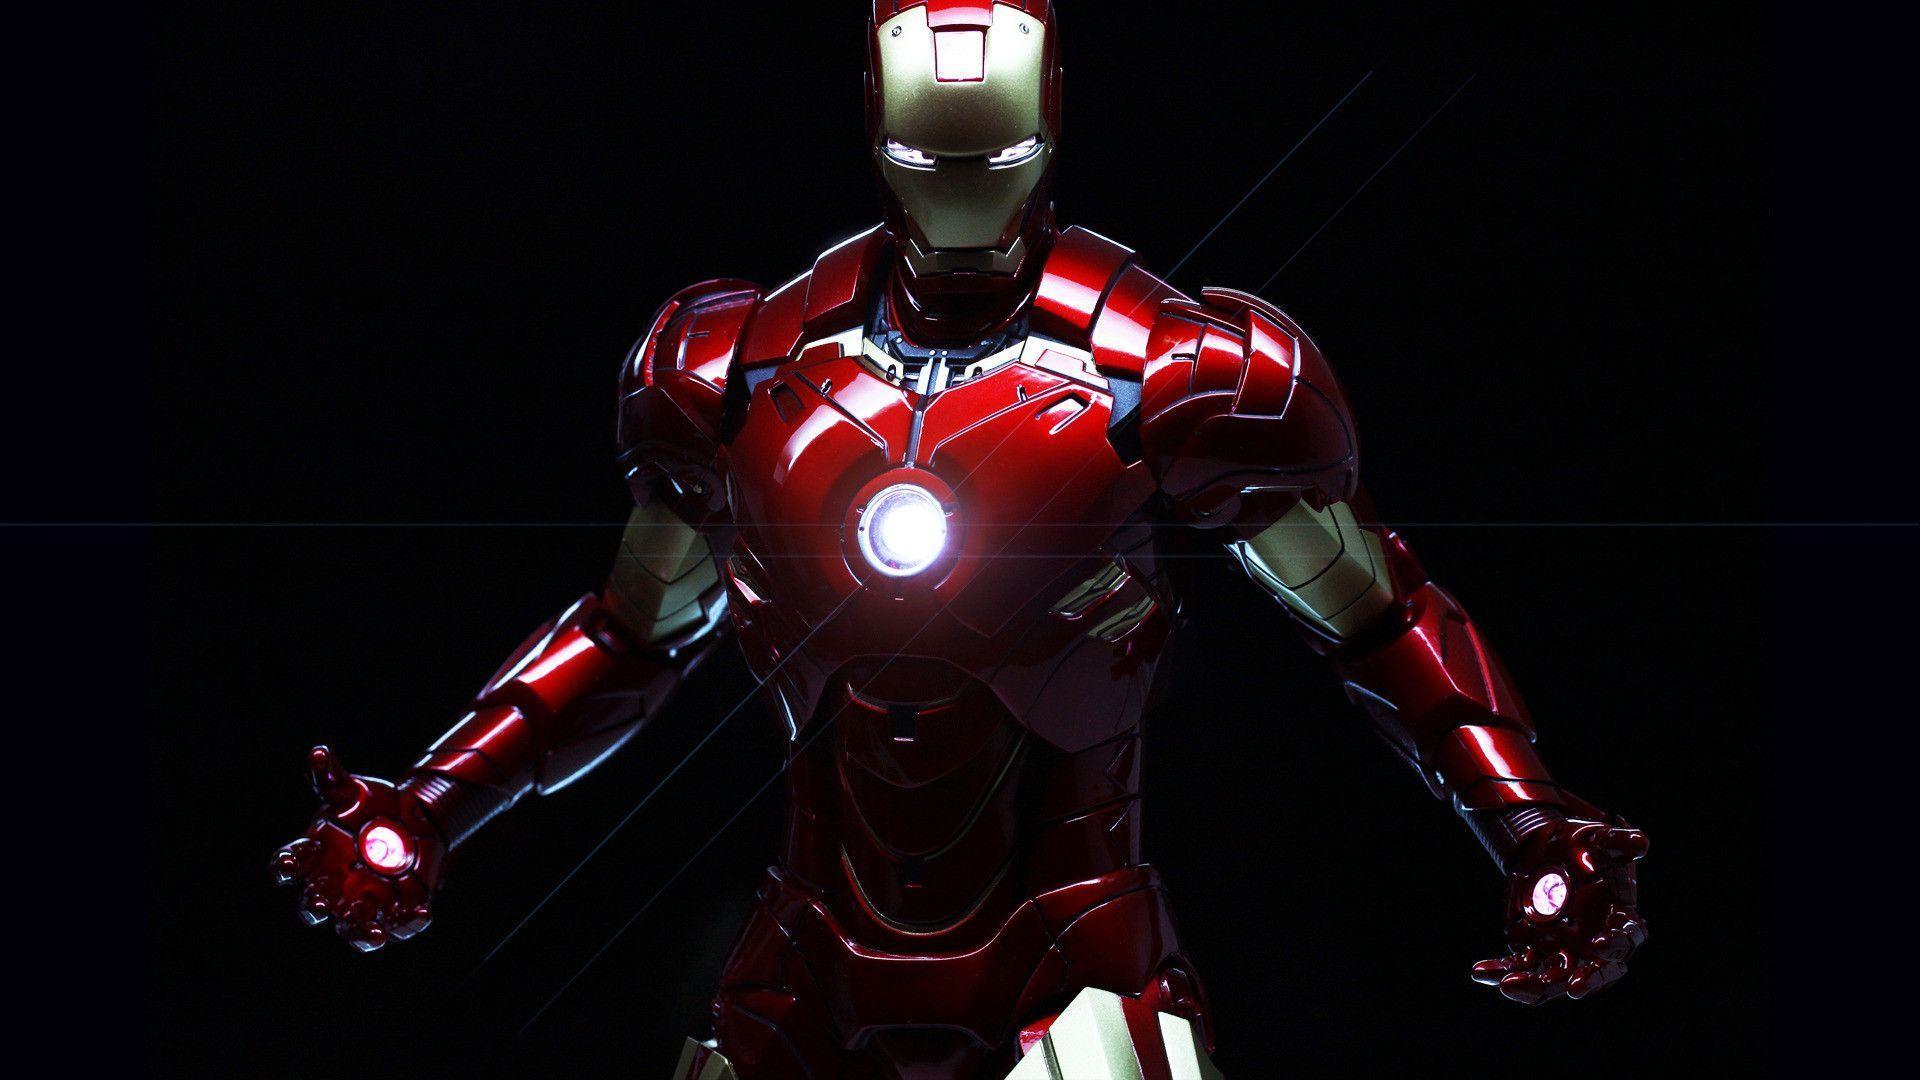 Iron Man Full Hd Wallpapers Top Free Iron Man Full Hd